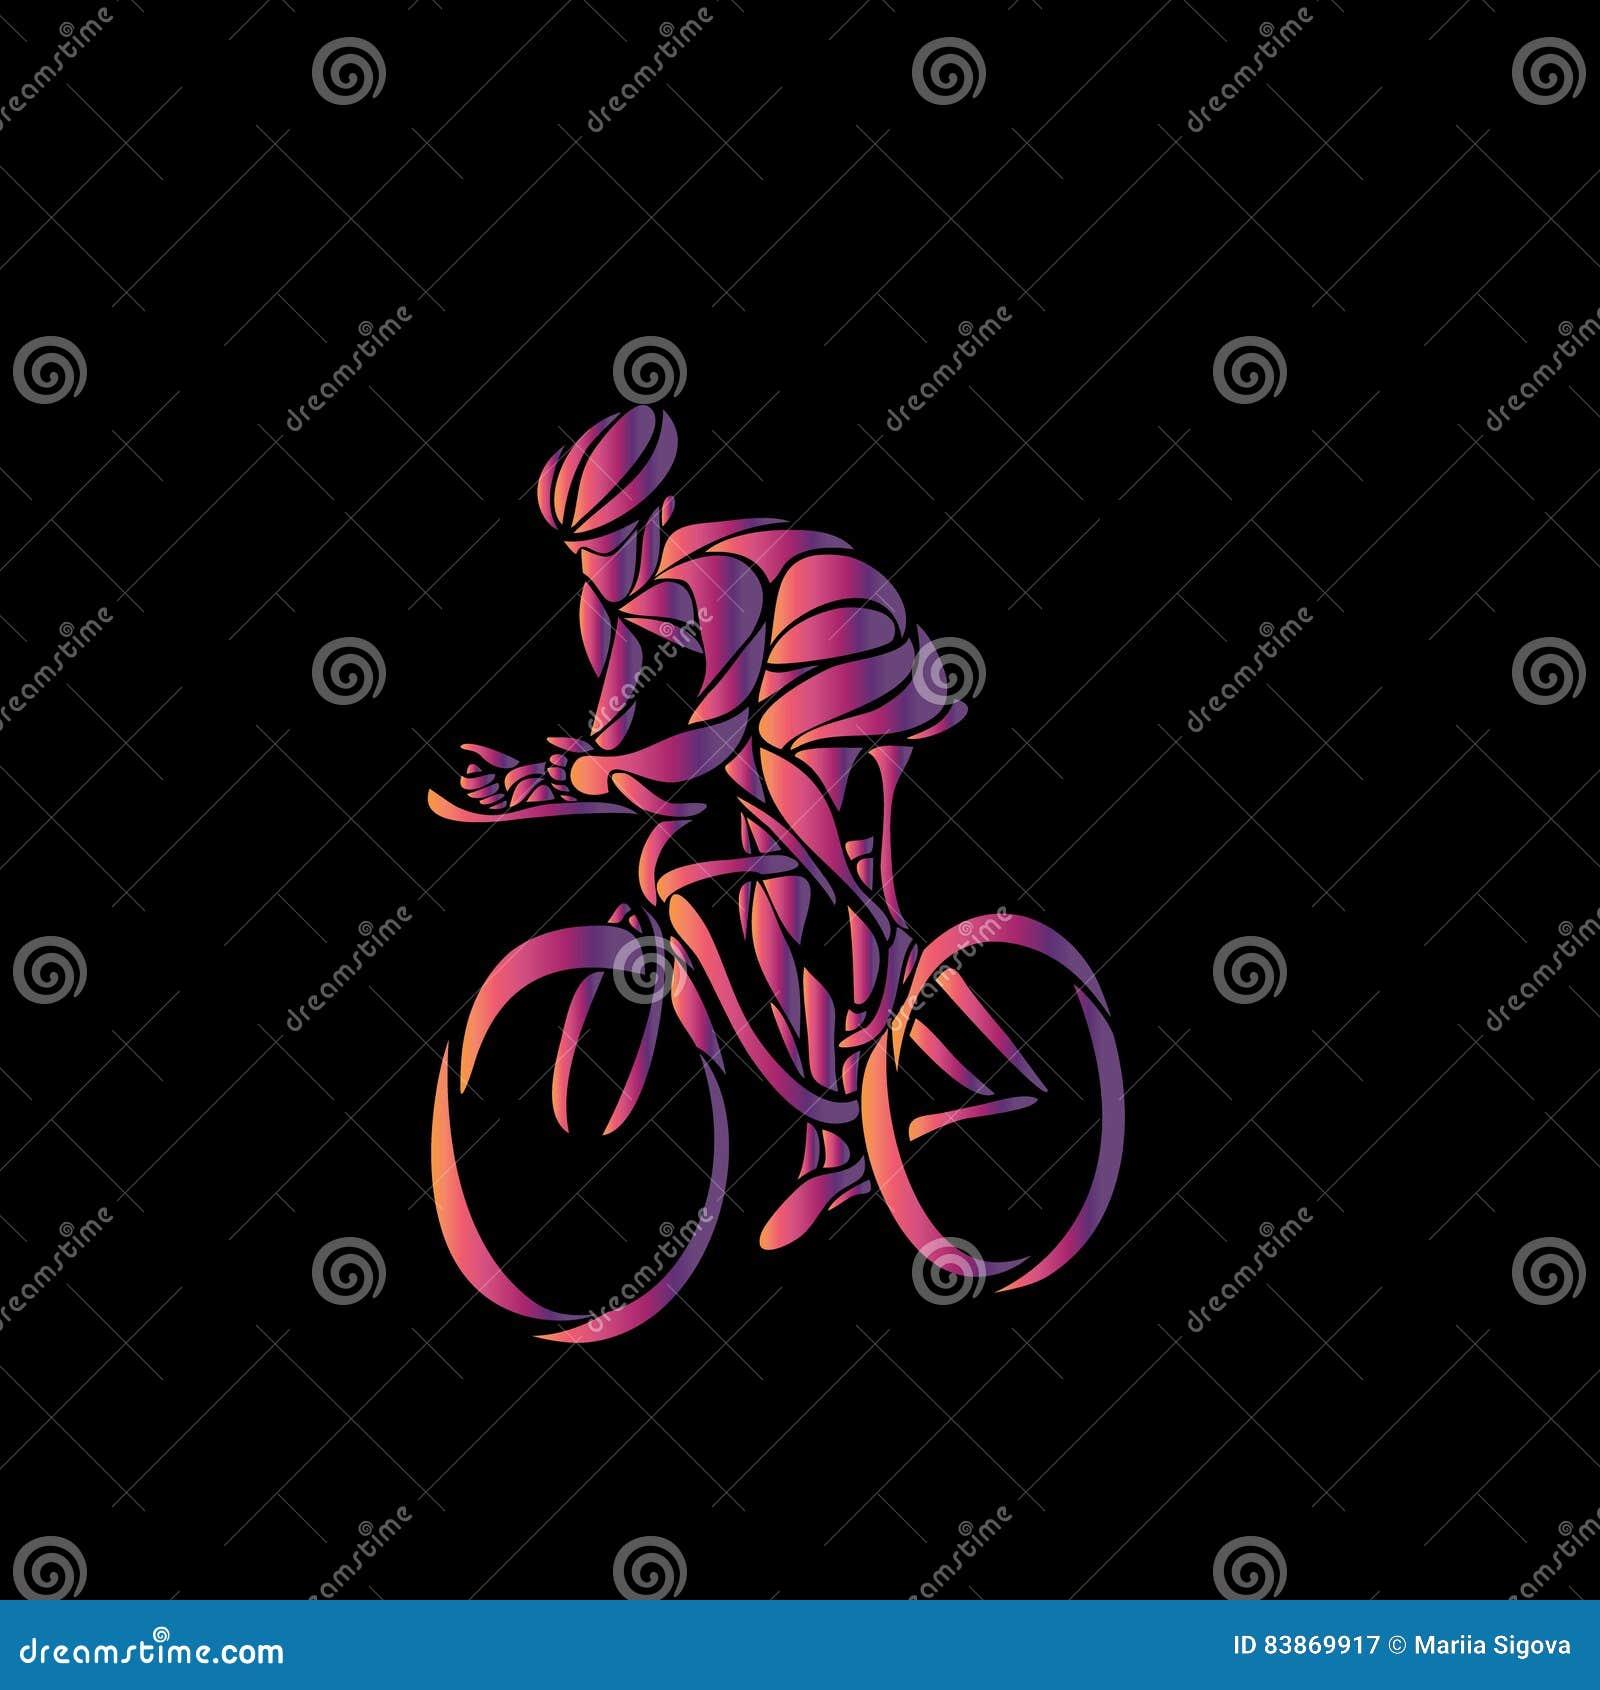 Bike Horn Color Page